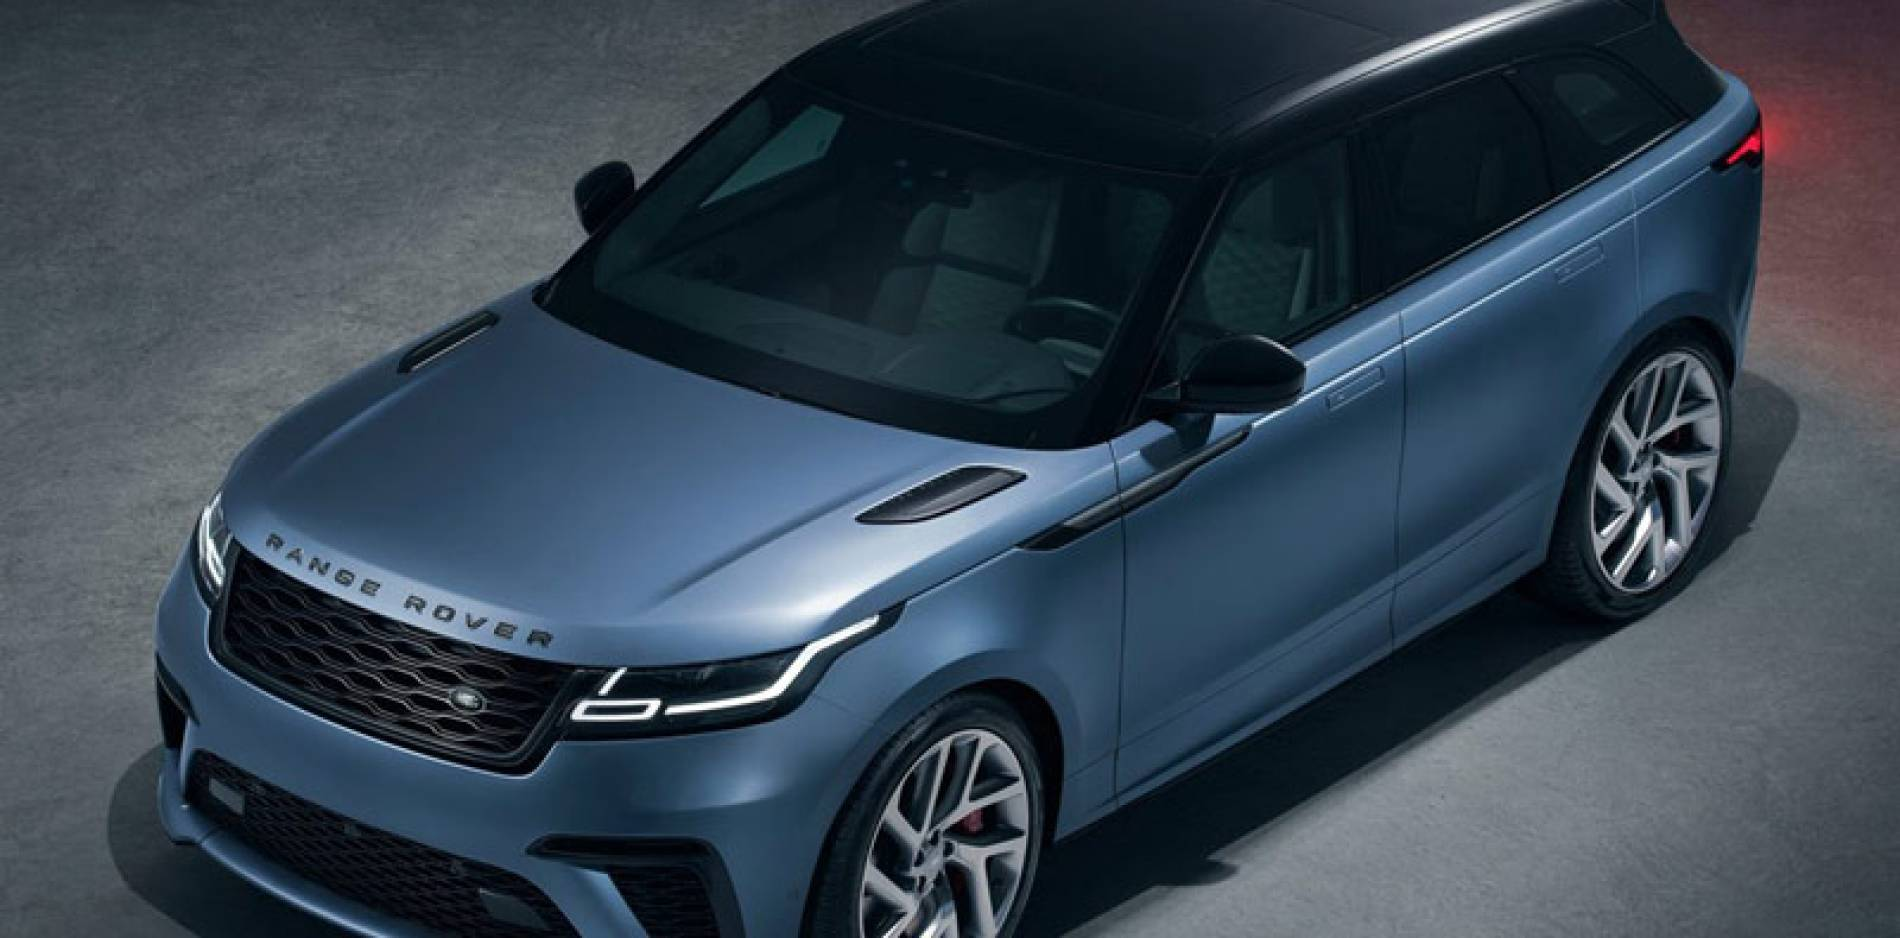 Range Rover Velar SVAutobiography Dynamic Edition, 550 CV de disfrute